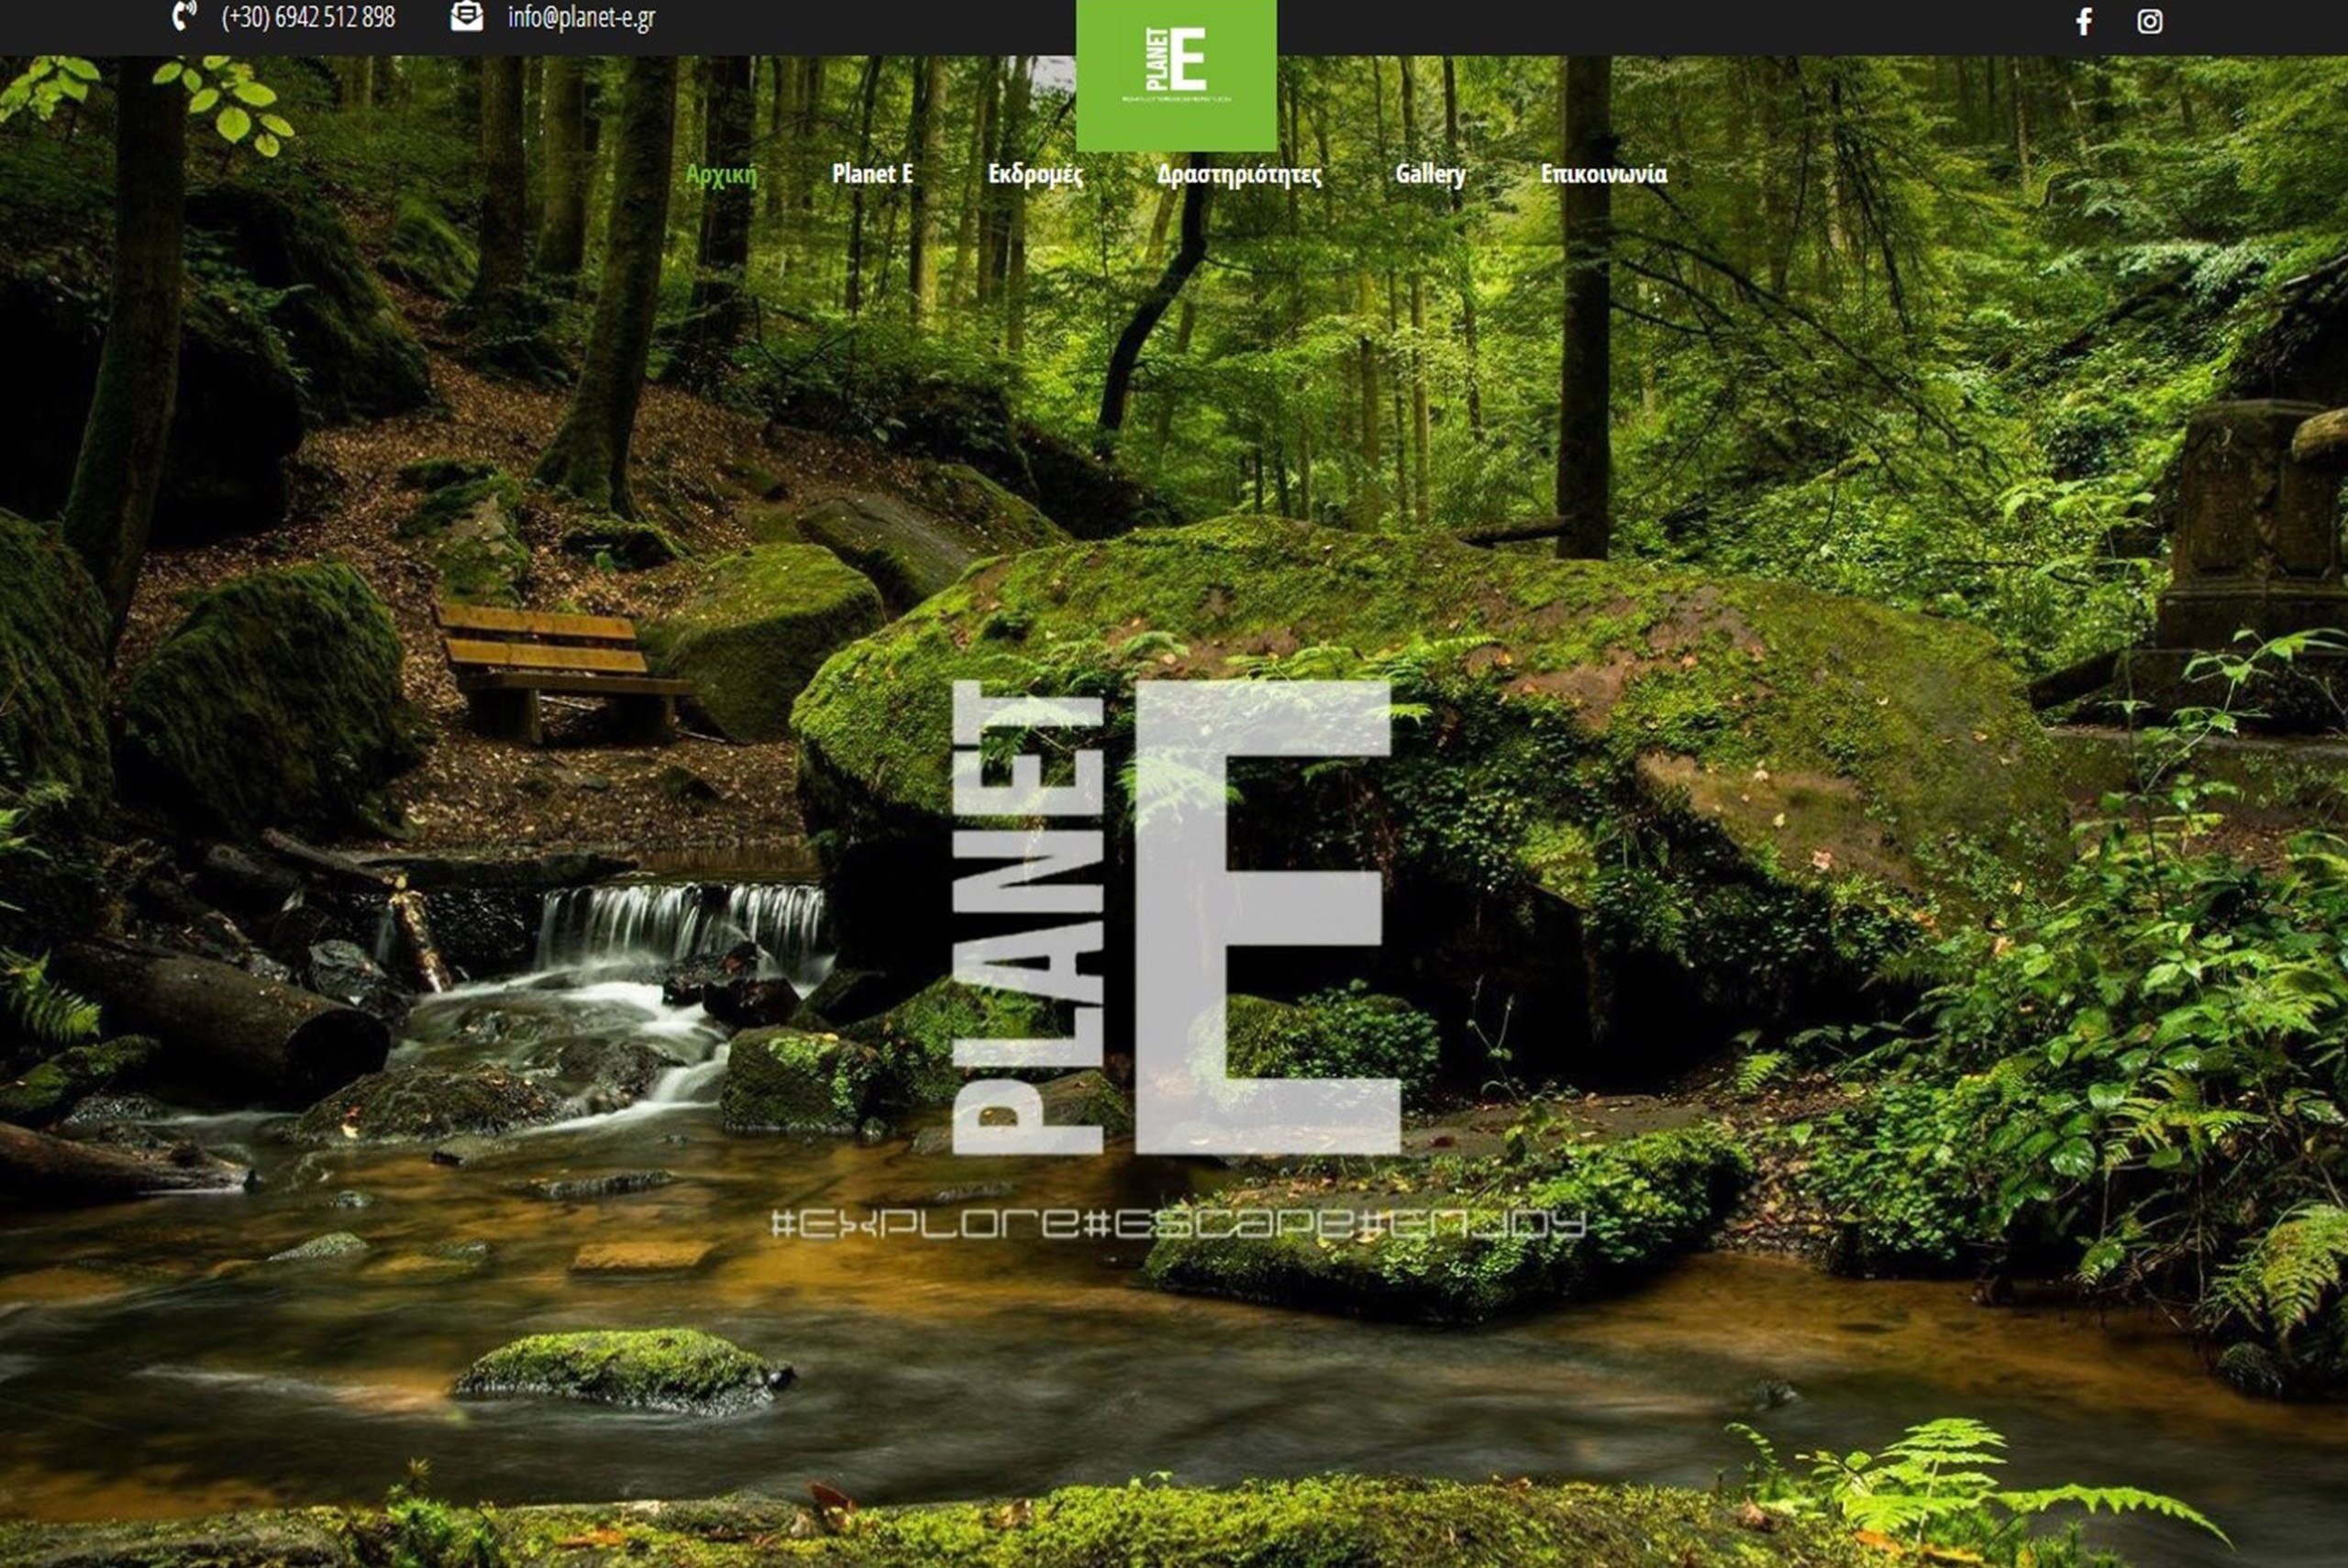 planet e site home page